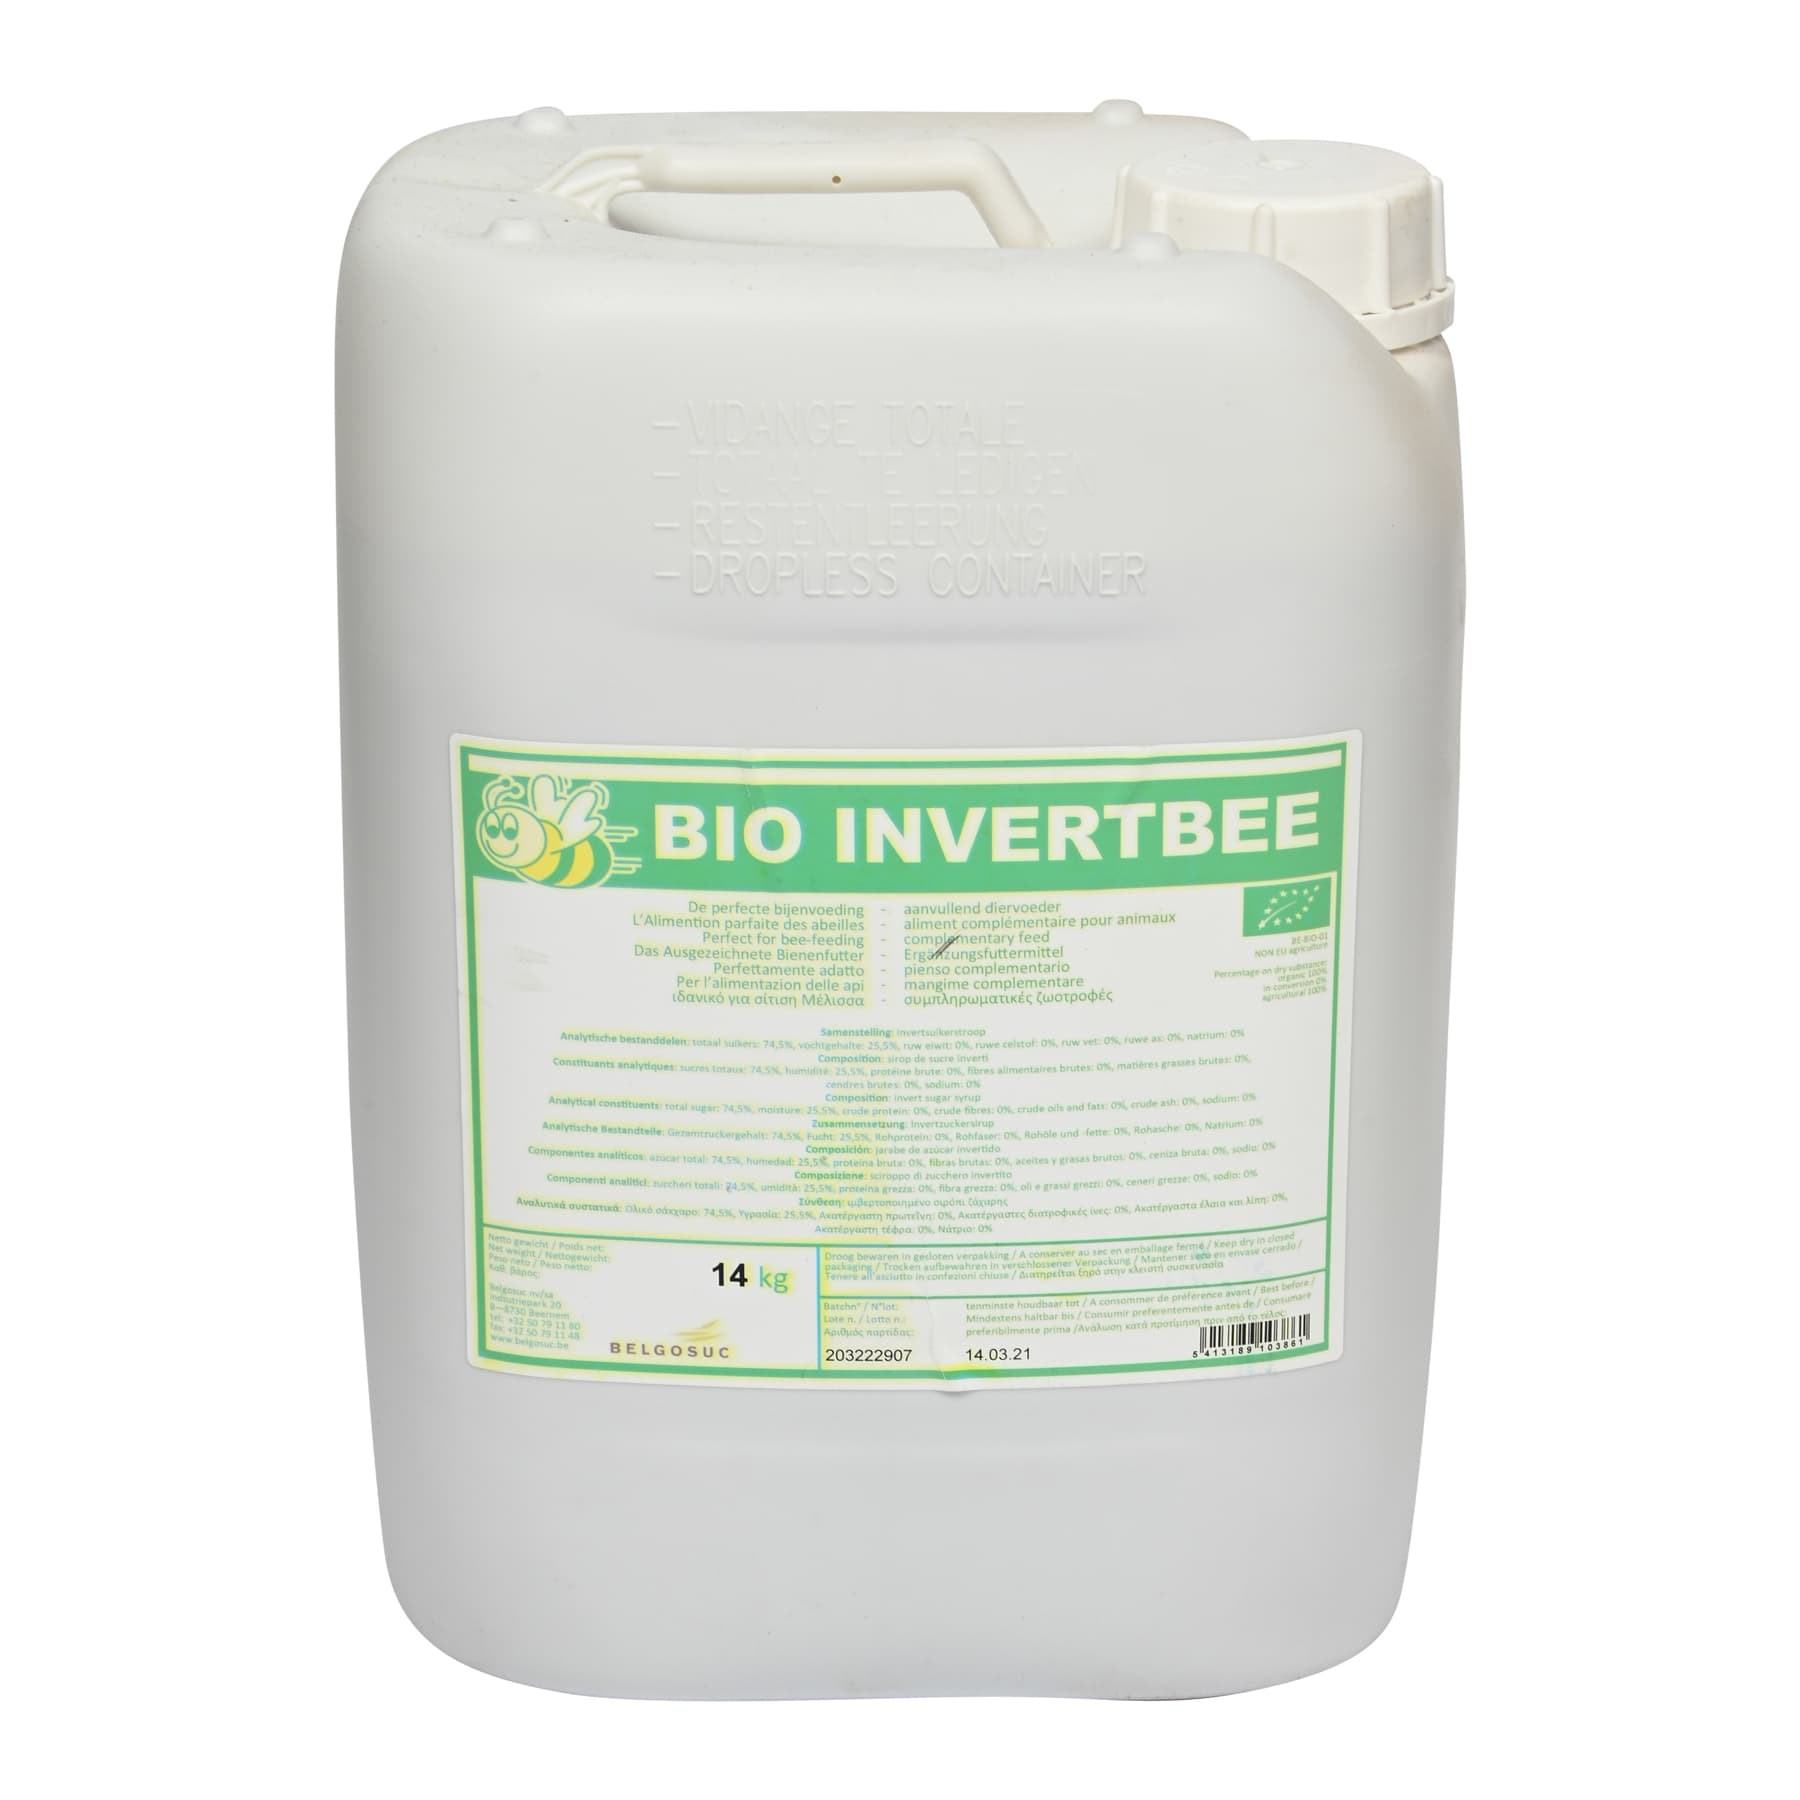 Bio Invertbee14 Kg Kanister unsere Öko Kontrollnr.DE-ÖKO-034